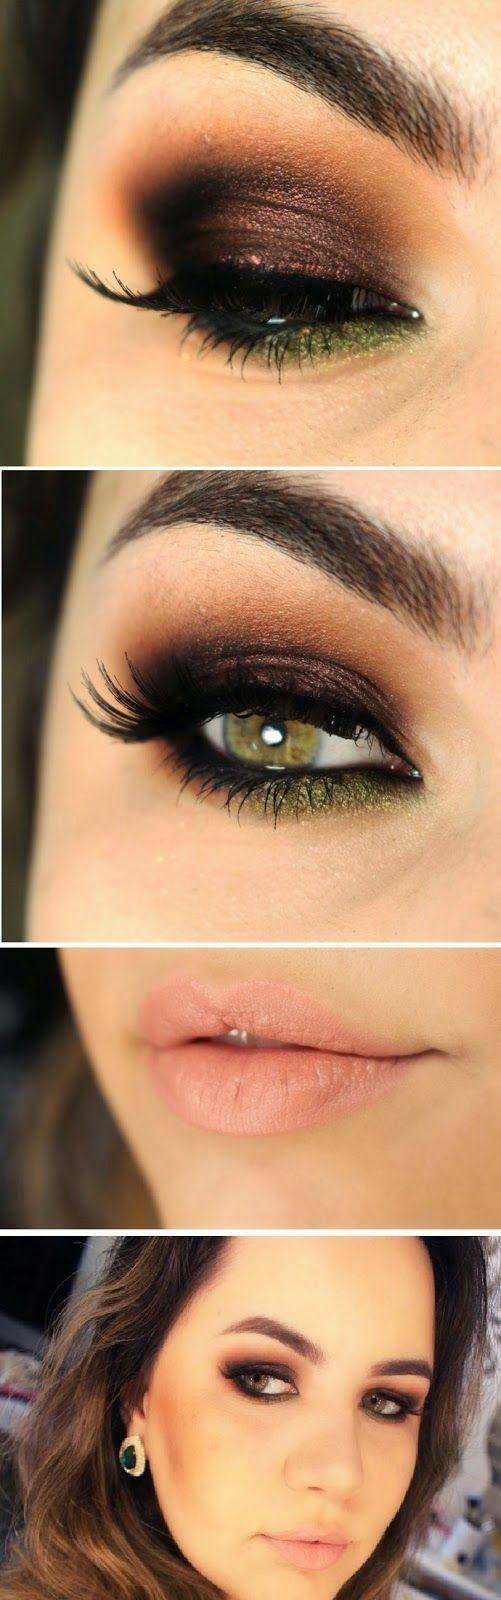 Gorgeous Eyes Makeup Inspires Scar | Makeup for olive skin